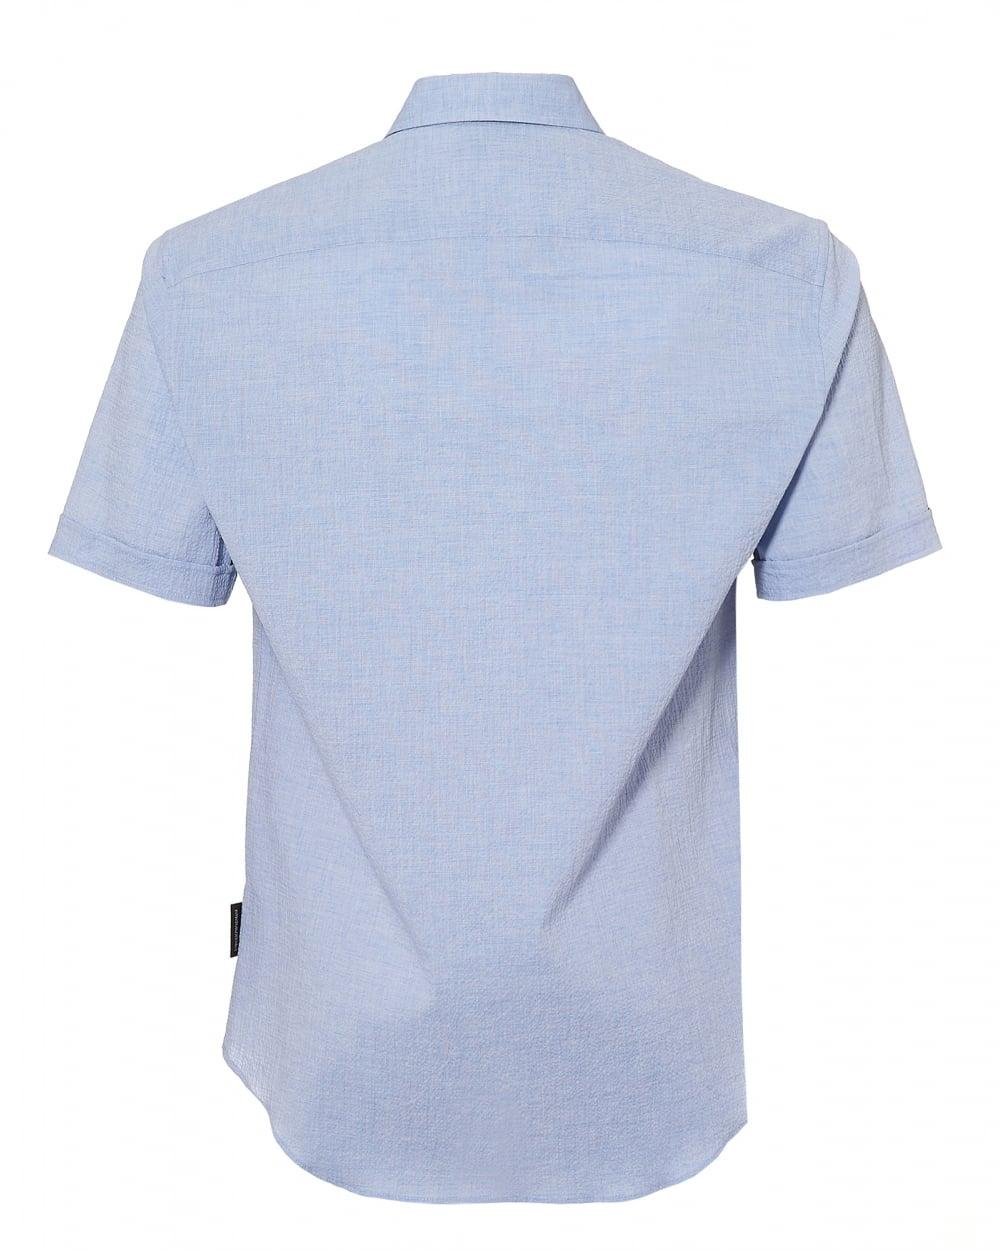 e1203a0f Emporio Armani Mens Sky Blue Seer Sucker Linen Regular Fit Shirt